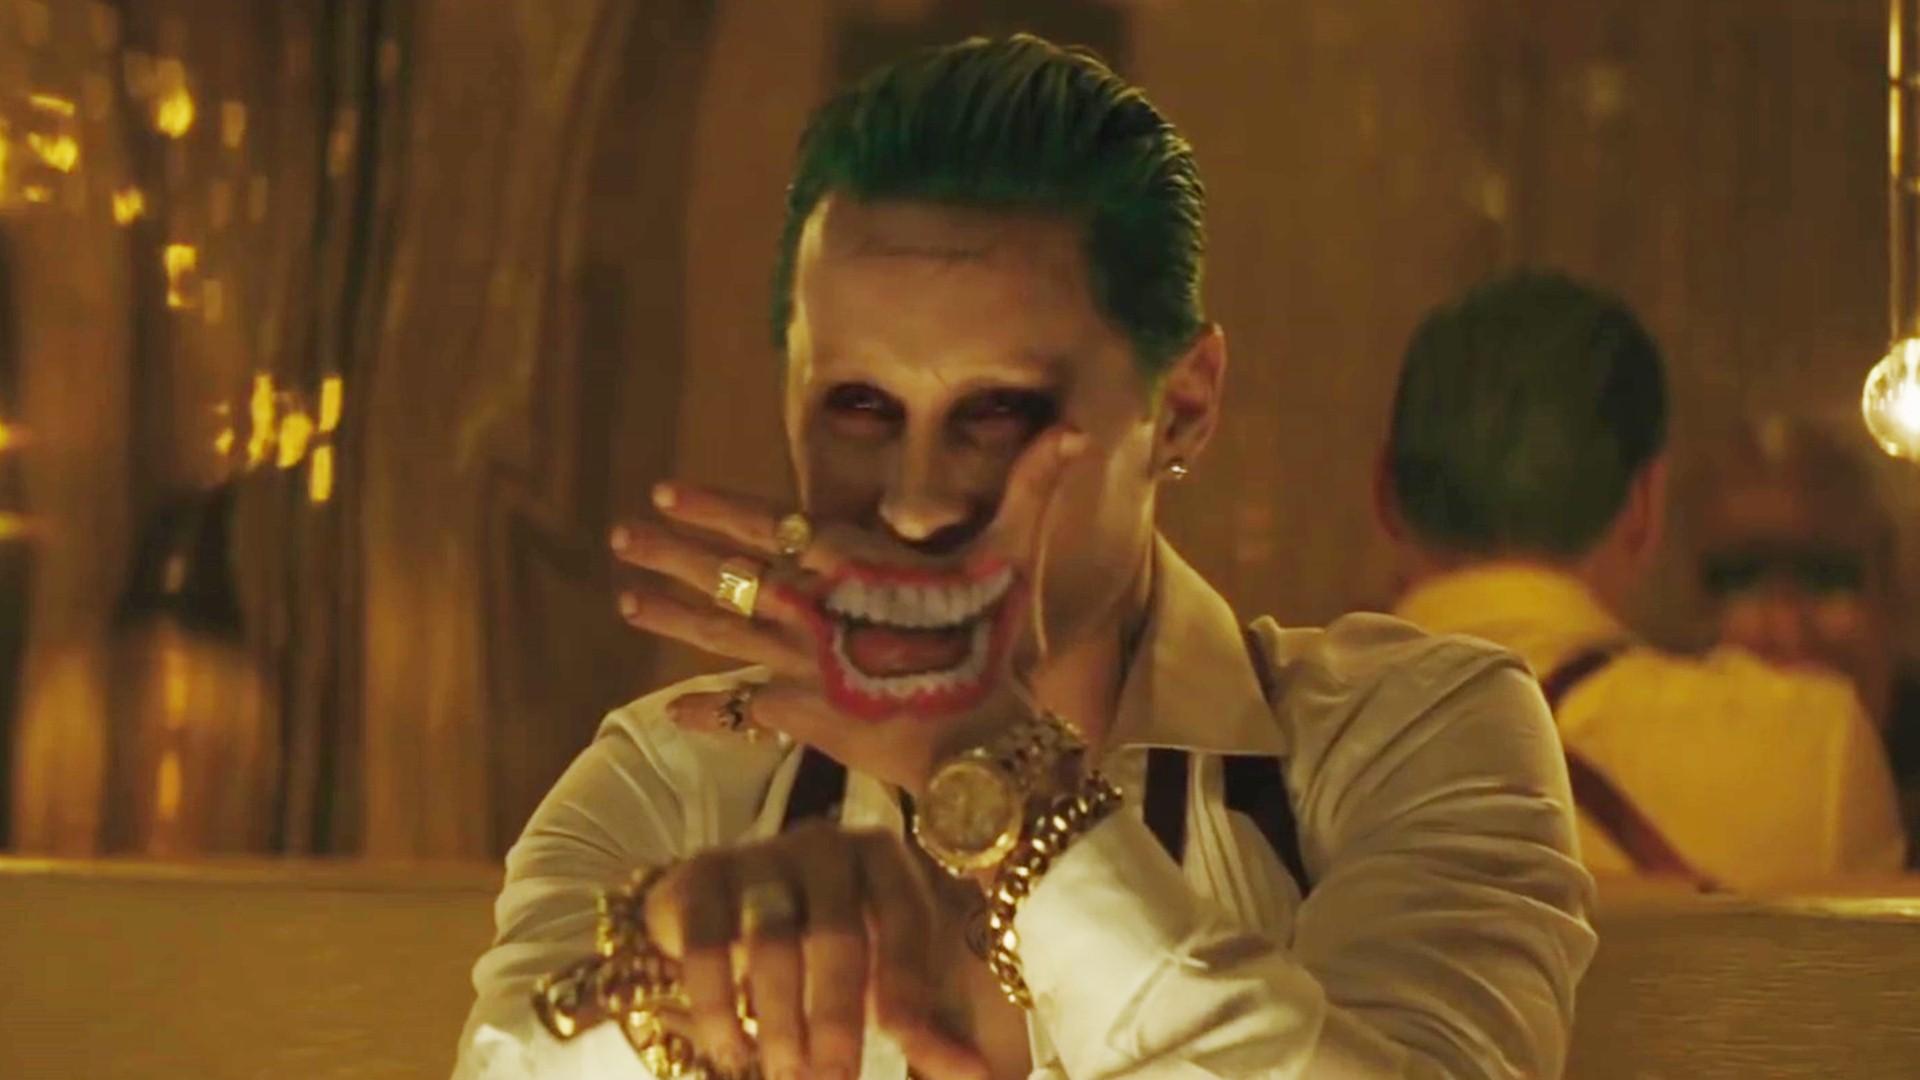 … Suicide Squad Joker HD Images 05623 Wallpaper …